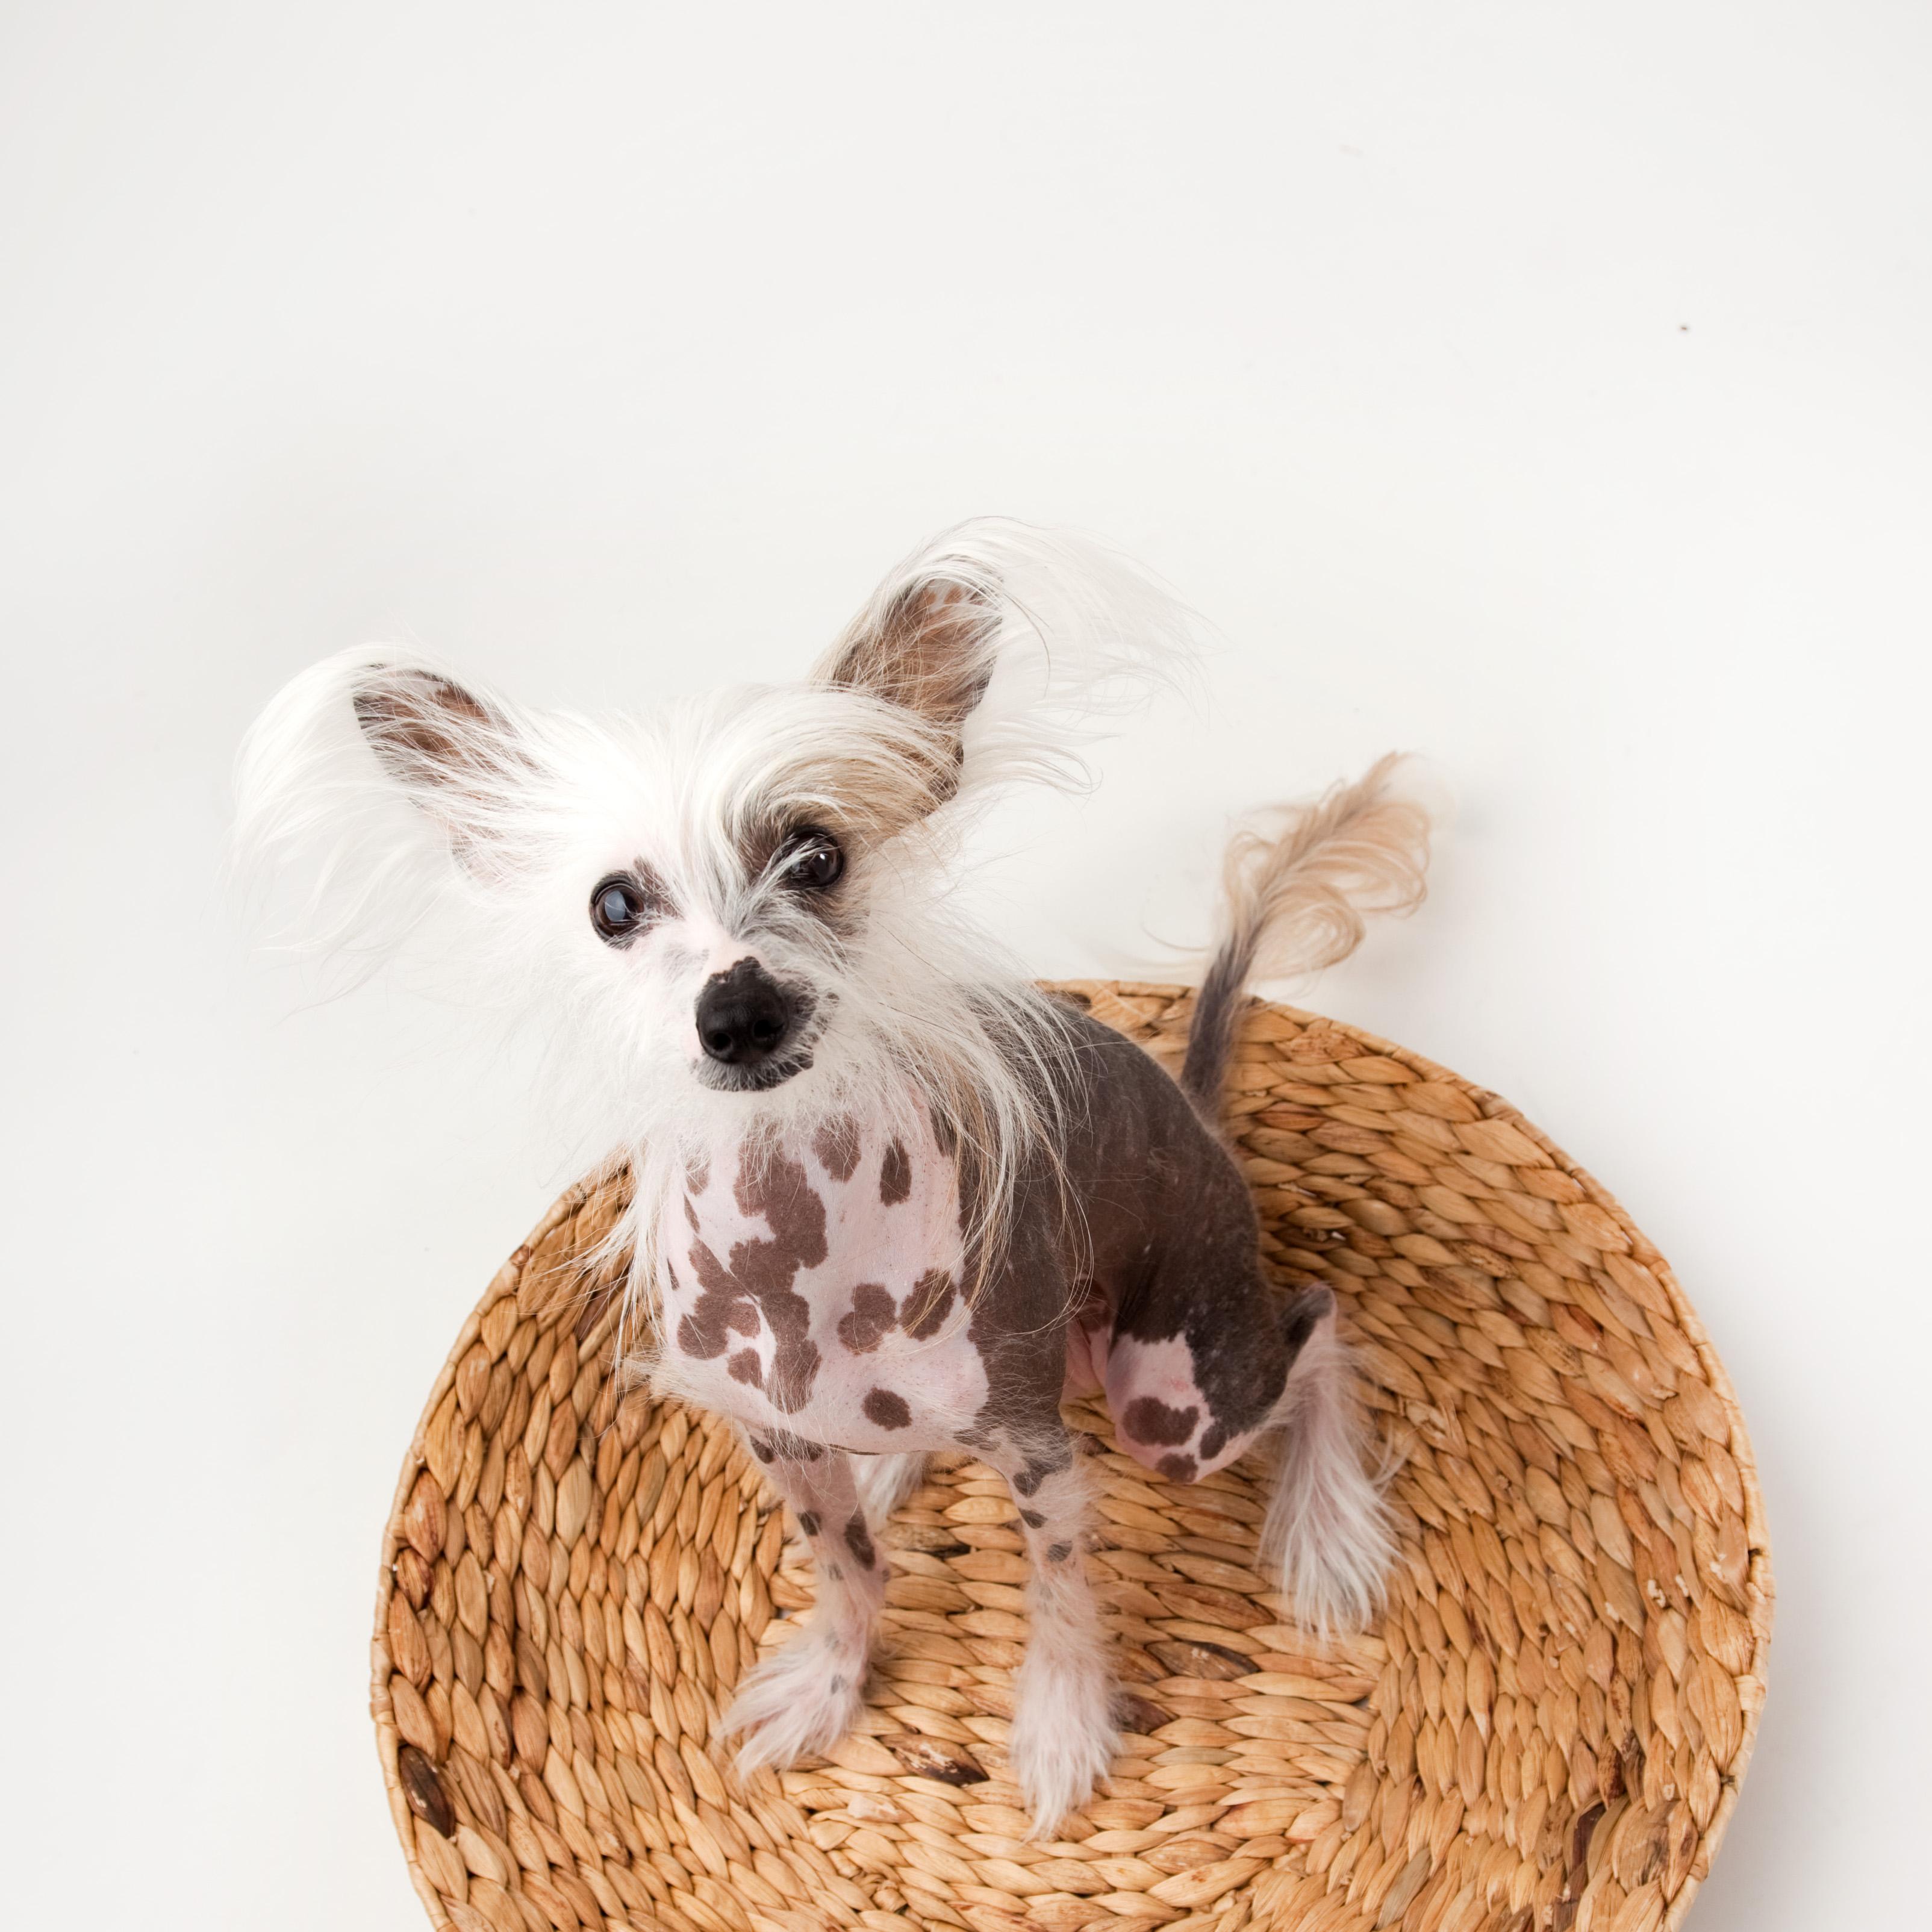 Teresa Berg Unleashed pet photography workshops